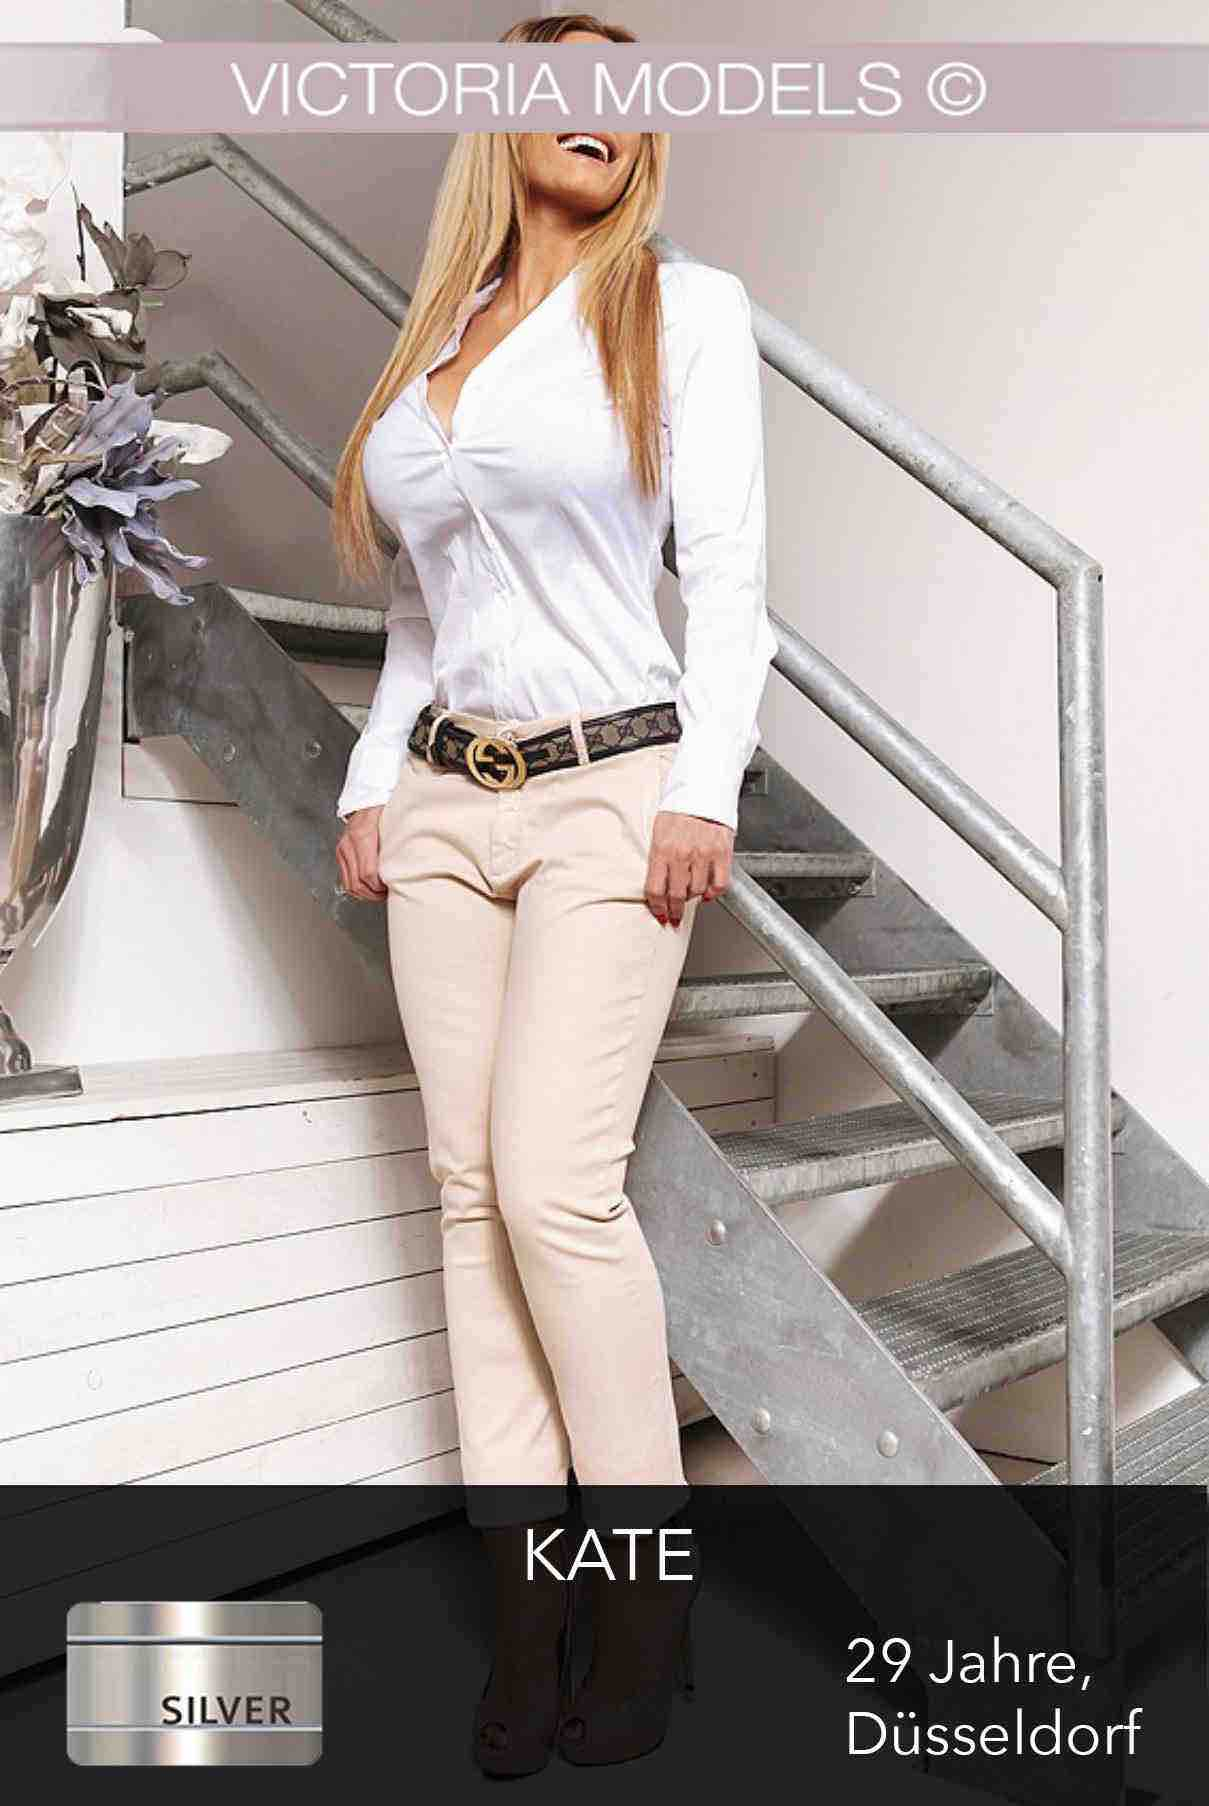 Kate Victoria Model